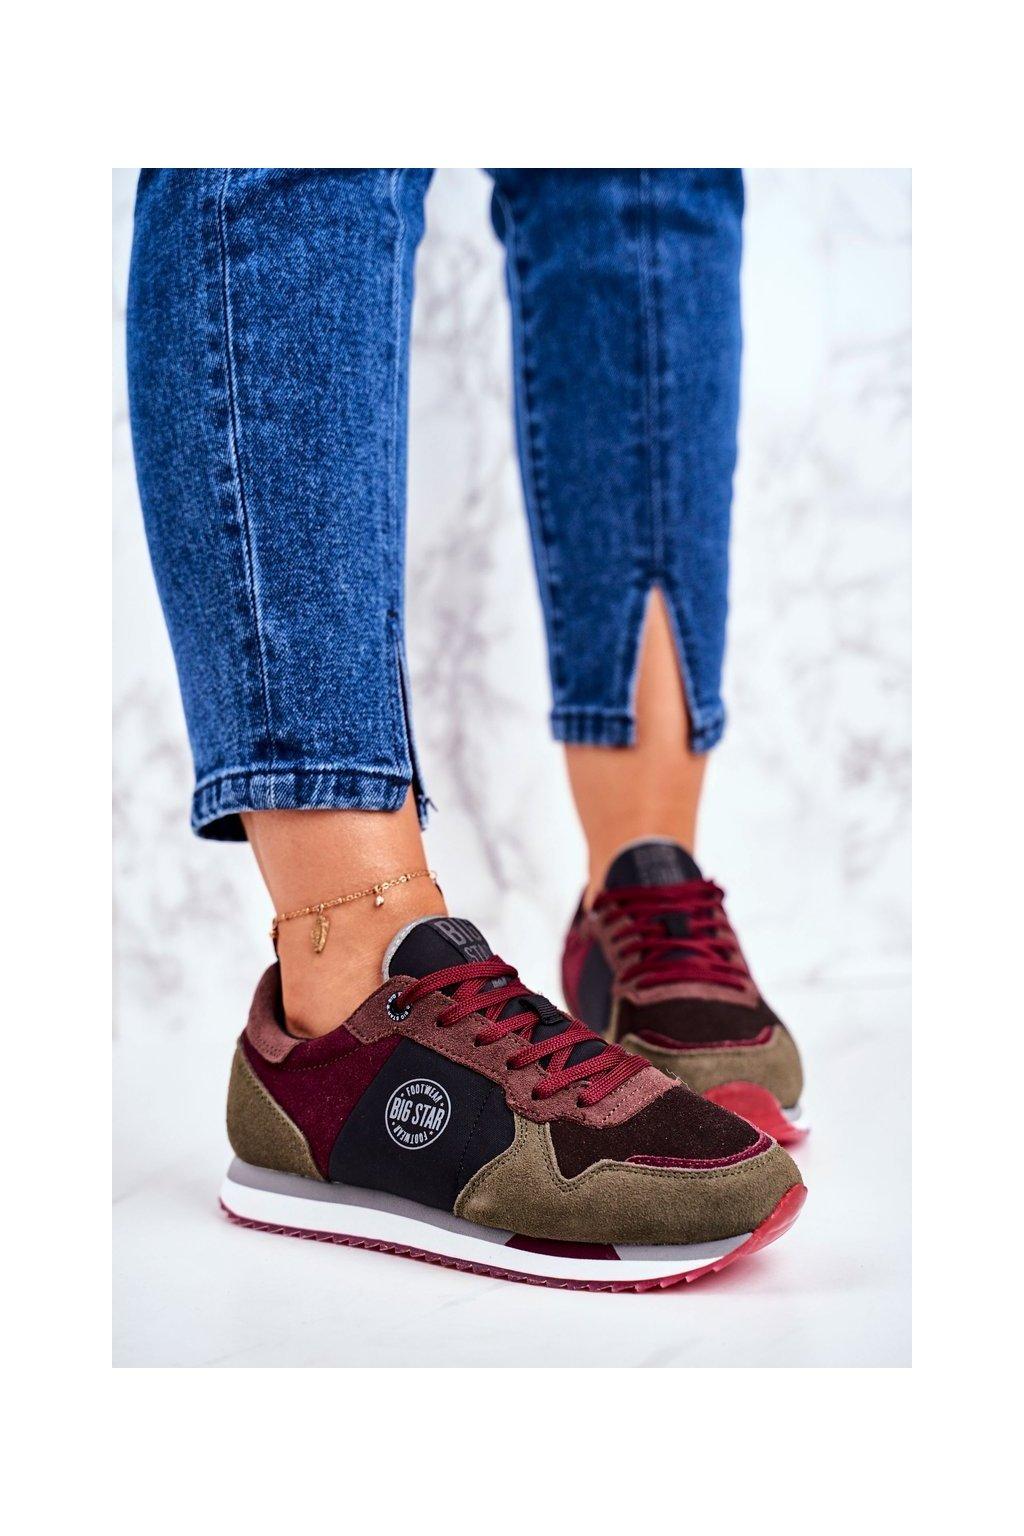 Dámske tenisky farba sivá kód obuvi GG274459 GREY/WINE